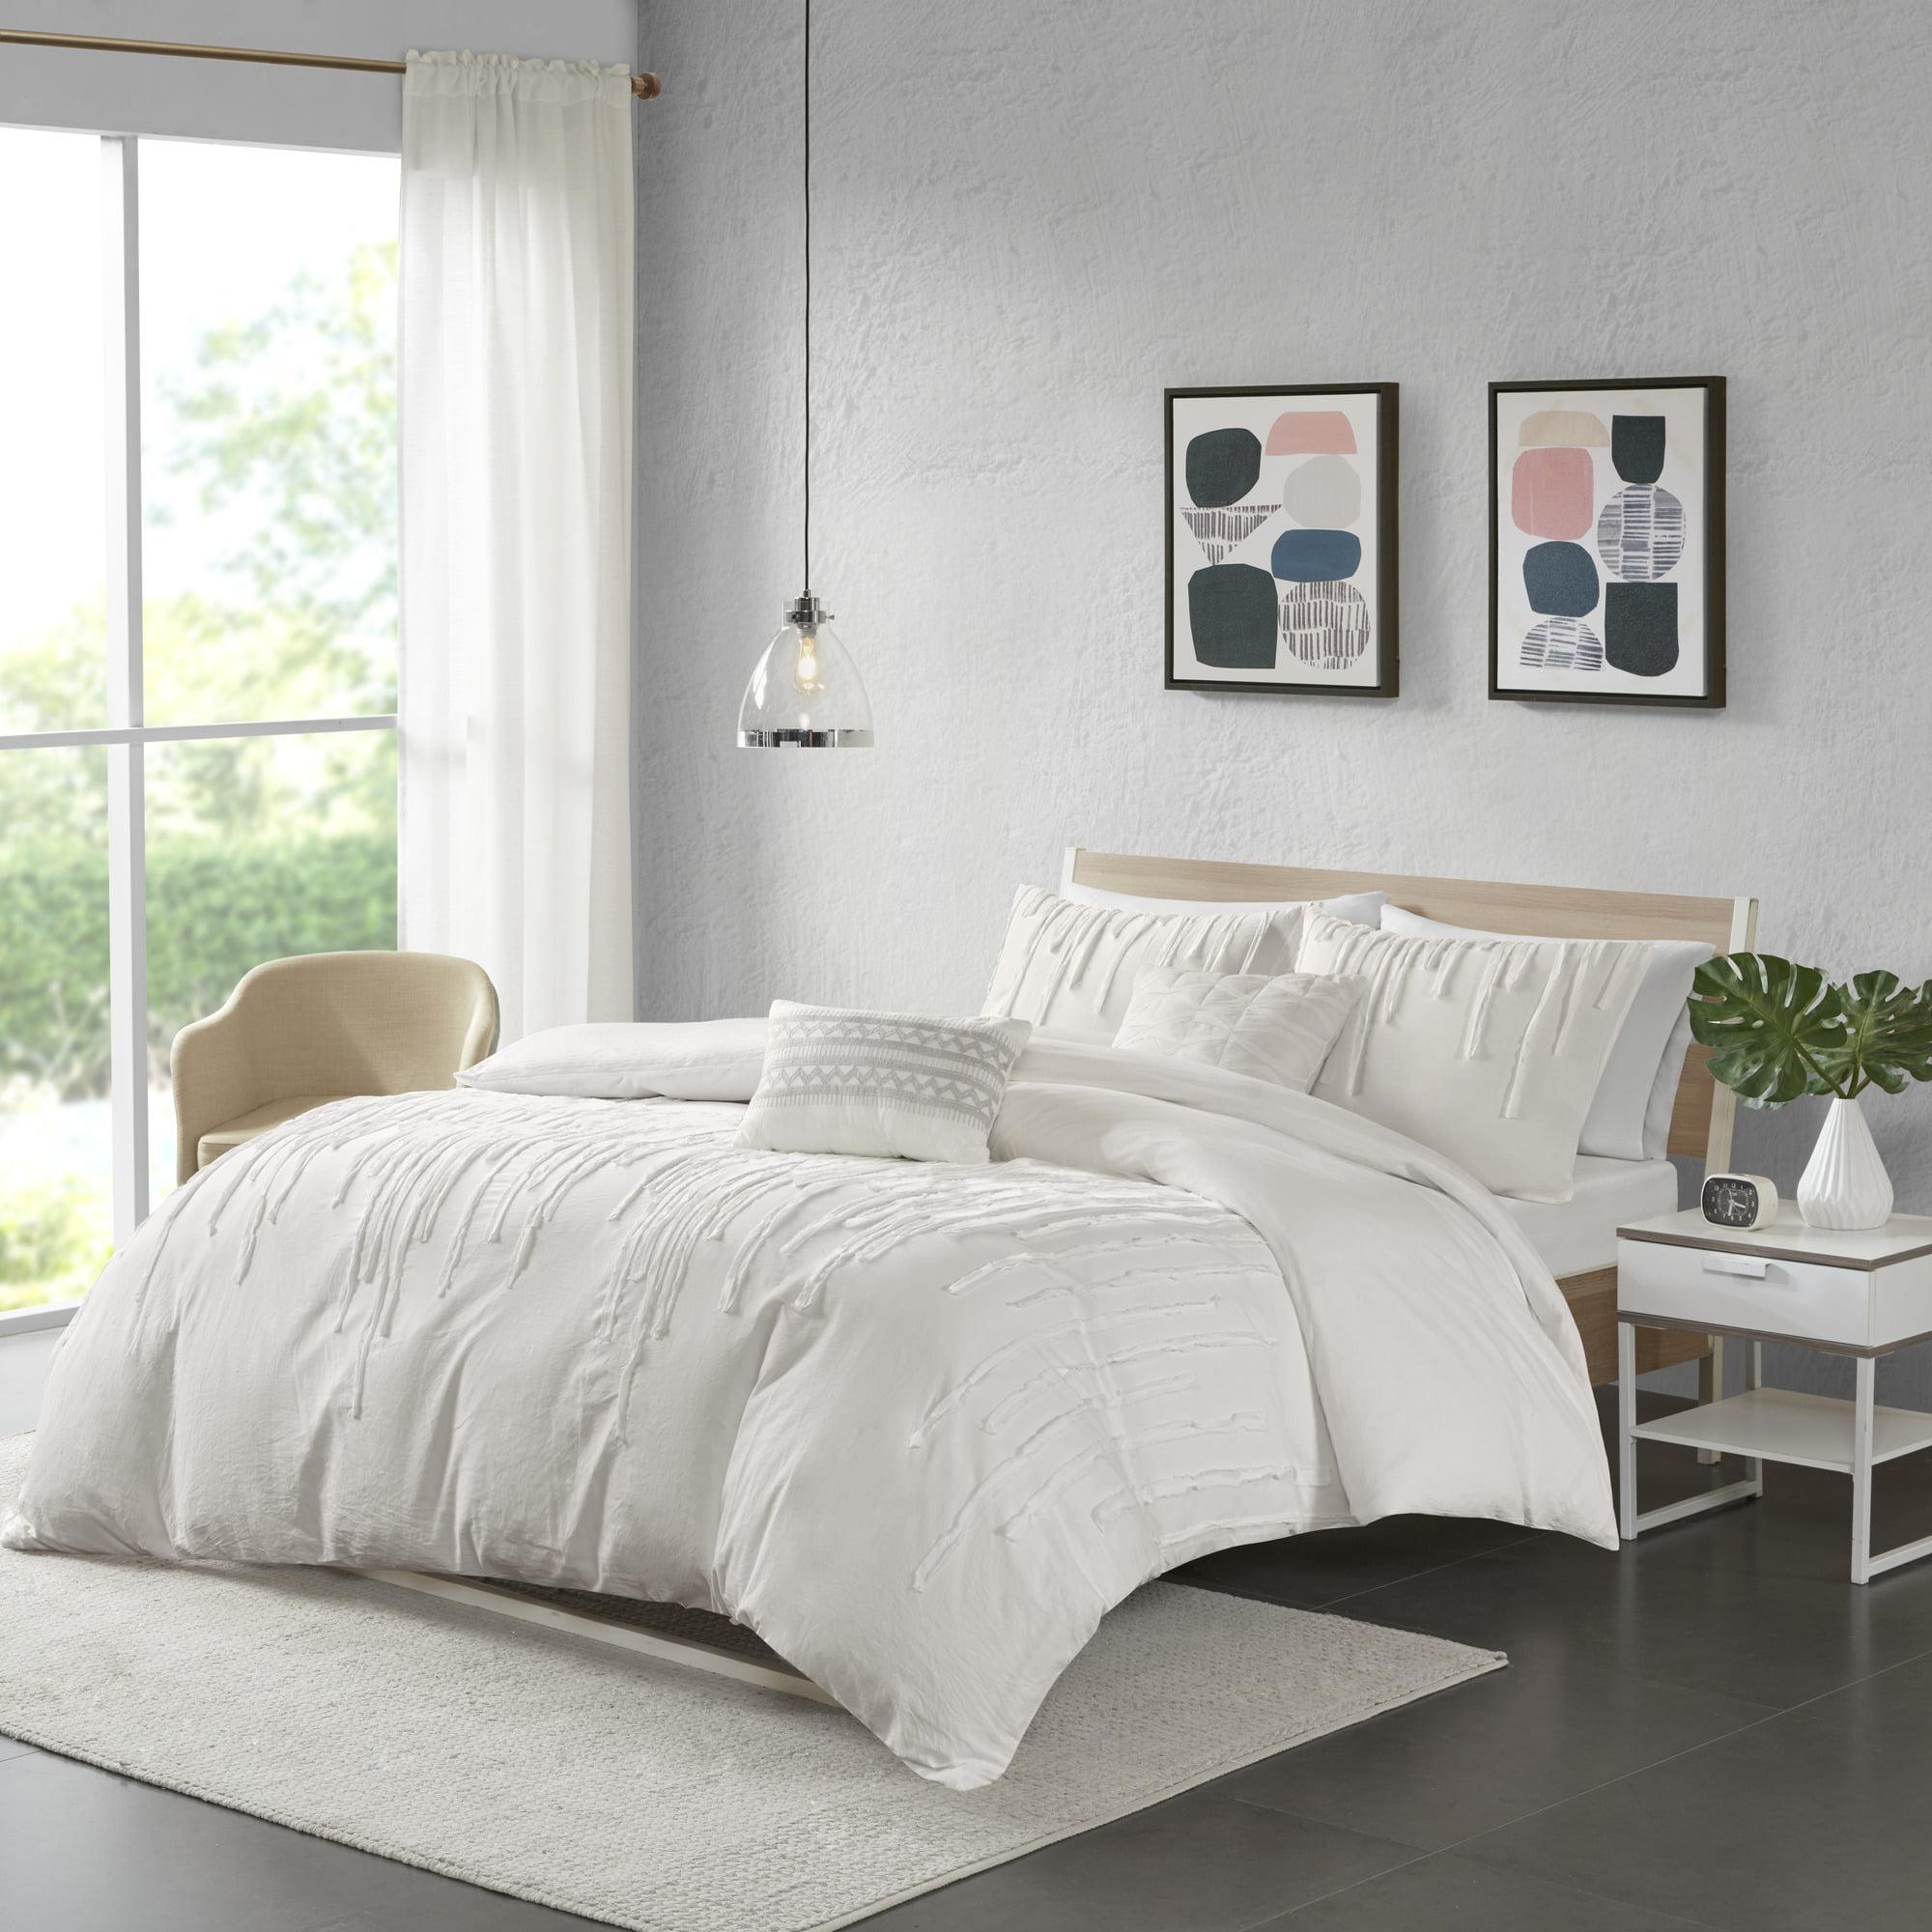 Home Essence Apartment Makenna Cotton Duvet Cover Set, King/Cal King, Ivory